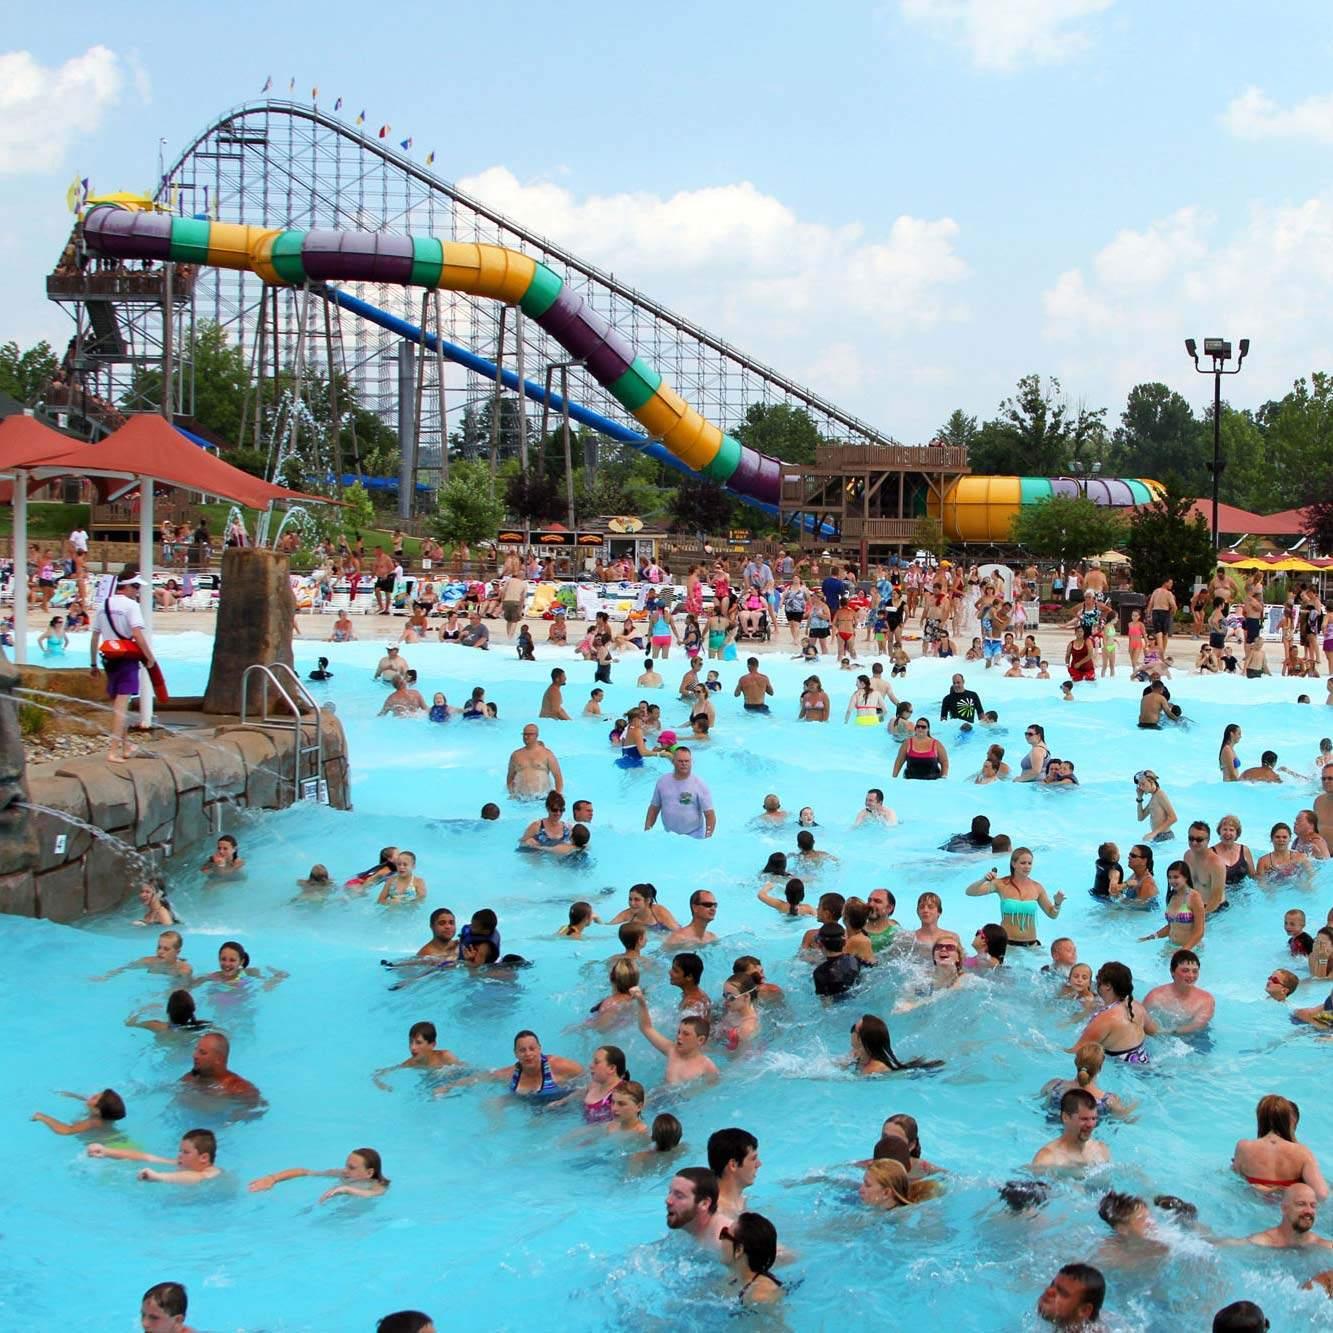 Bahari wave pool holiday world splashin safari photos gumiabroncs Image collections